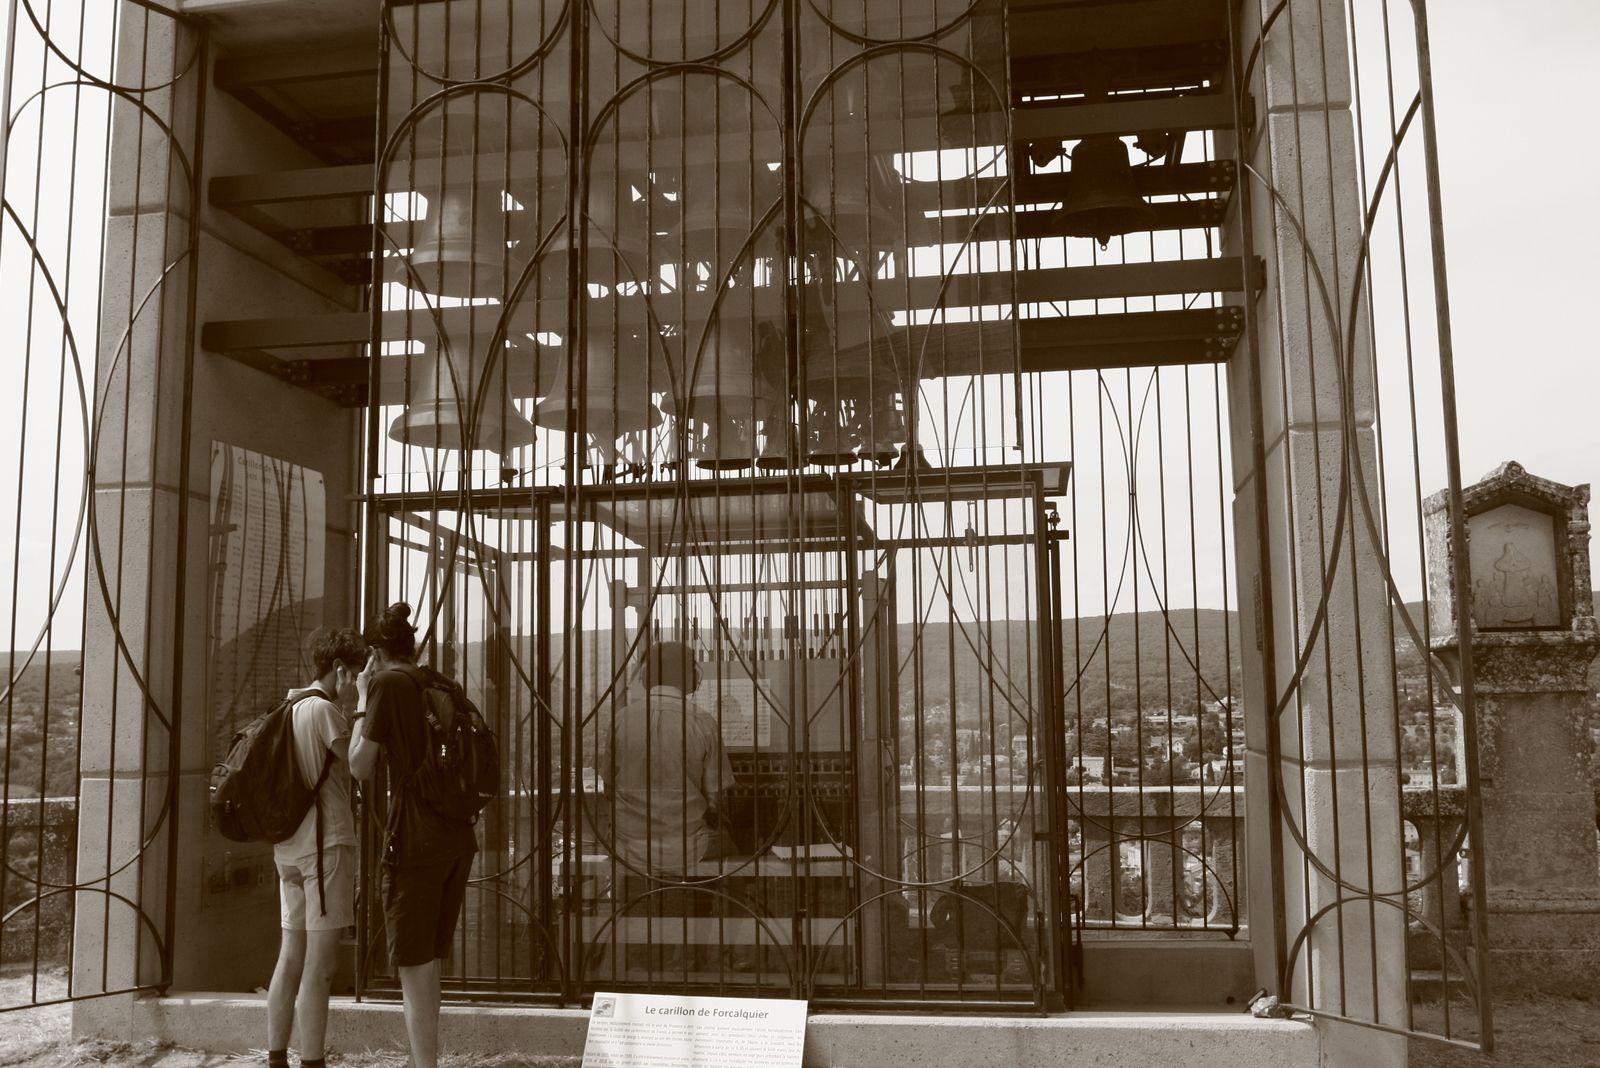 Le carillon de Forcalquier